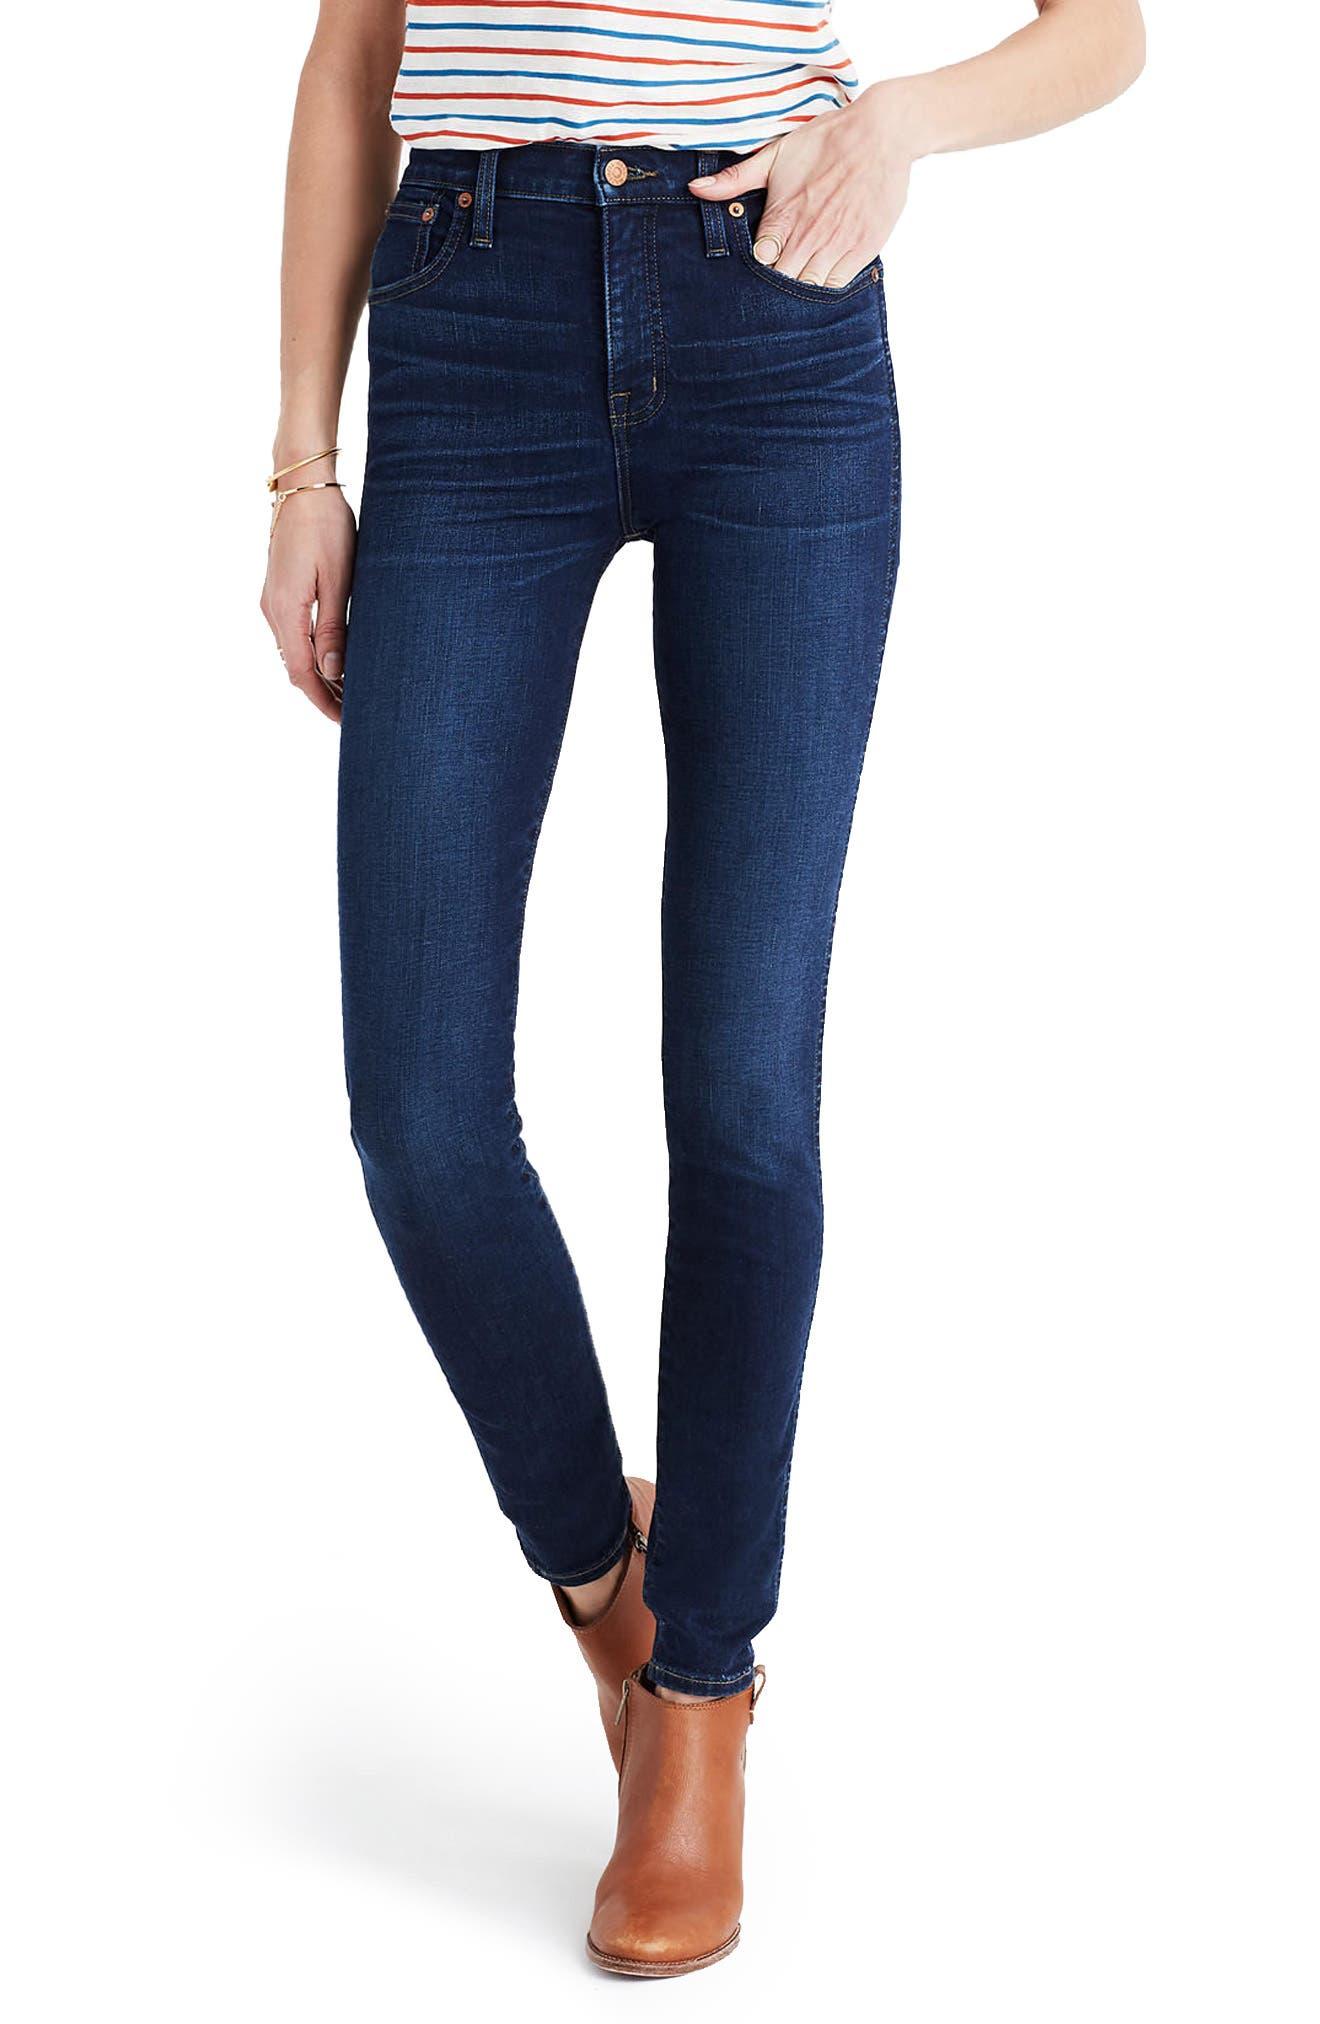 10 long skinny jeans